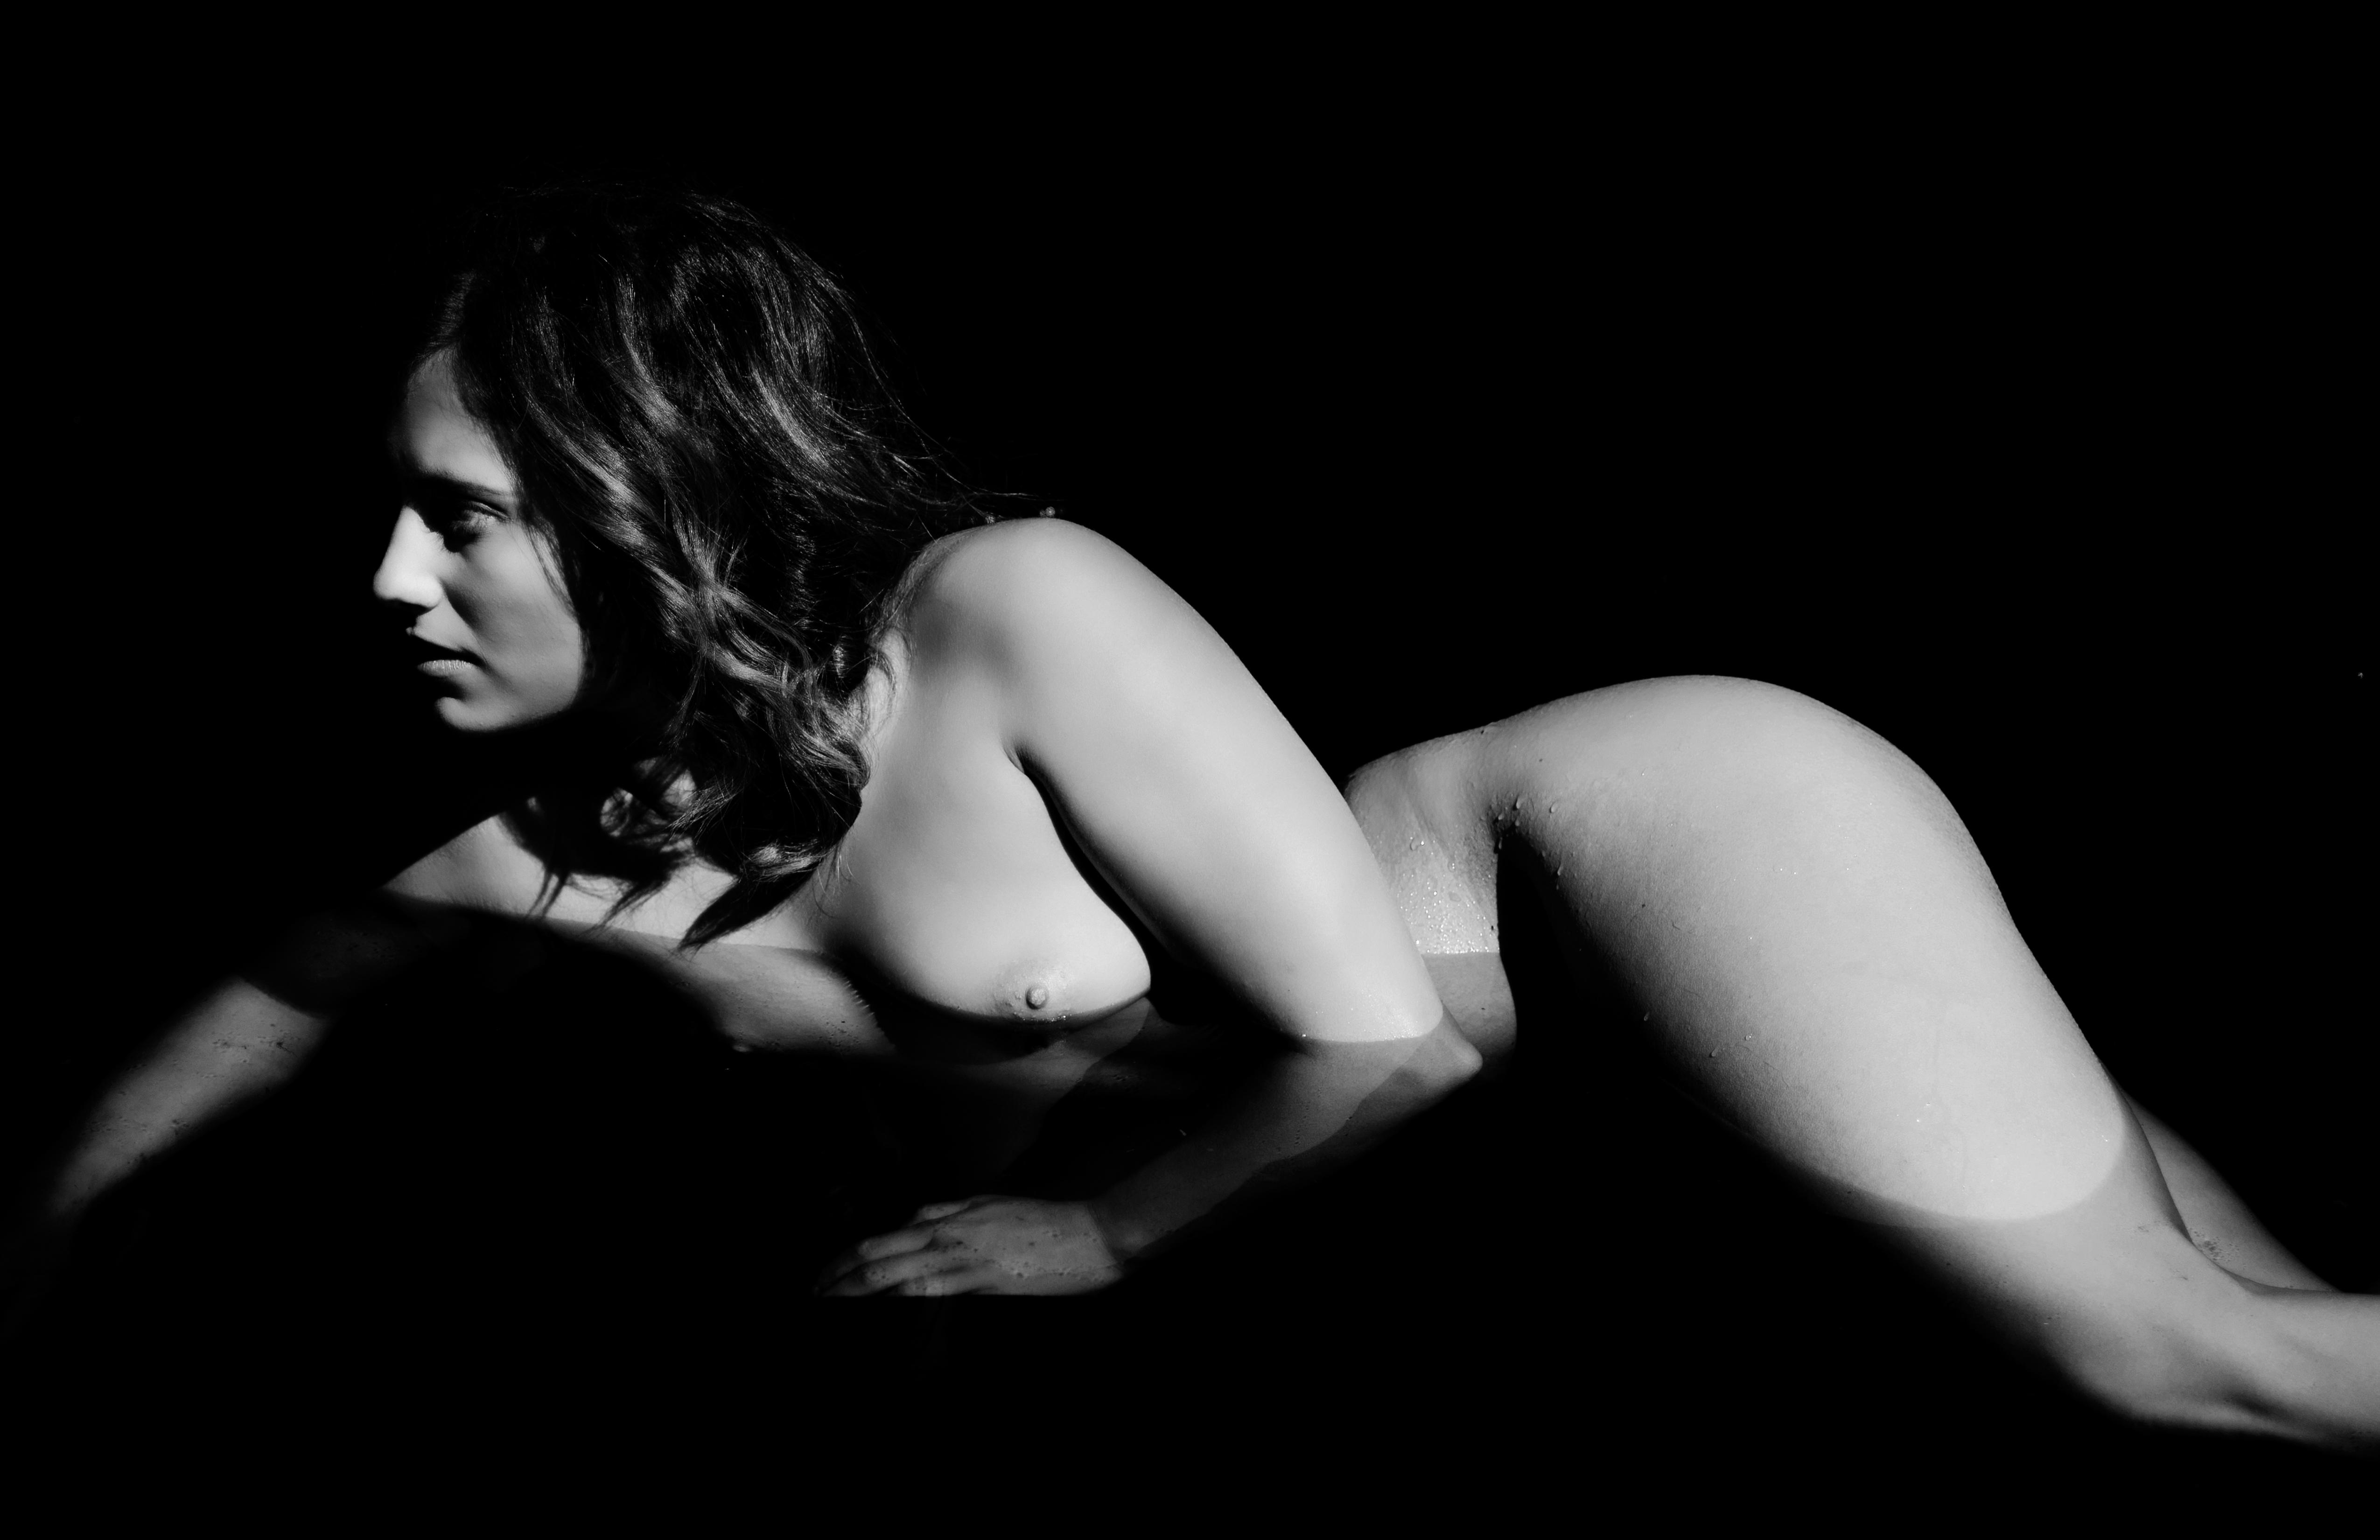 Erin esurance hentai sex porn images